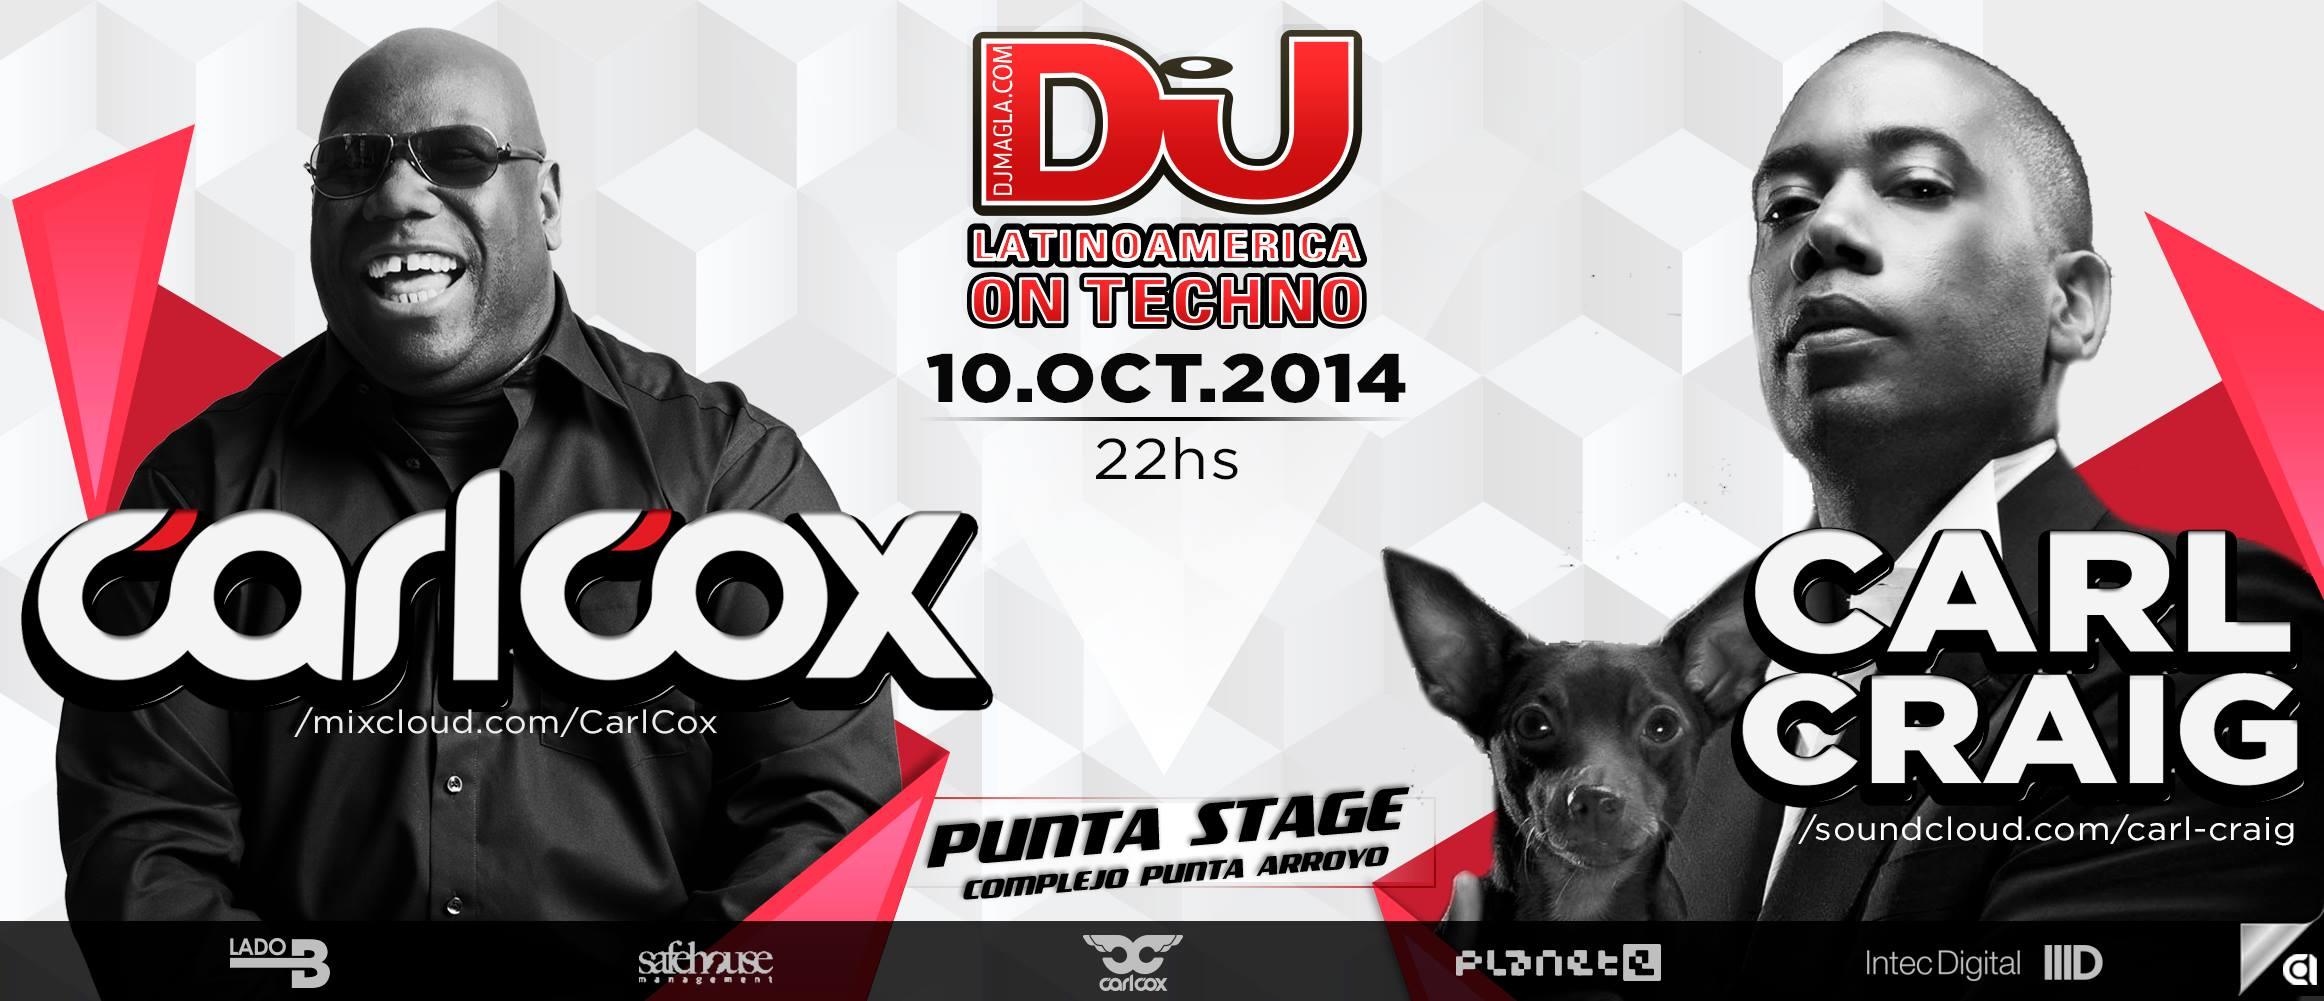 Carl Cox- Punta stage